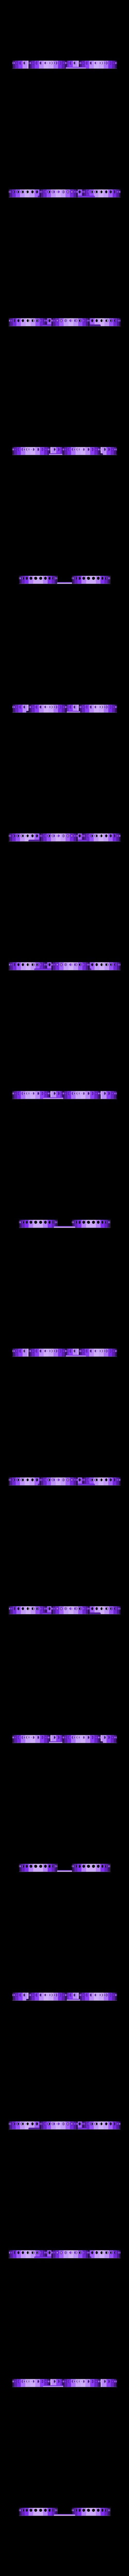 beecheeseframe_v02_50mmProps_12mmDucts_tankedition.stl Télécharger fichier STL gratuit Cadre semi-dirigé micro (cadre en Beecheese) • Plan à imprimer en 3D, noctaro